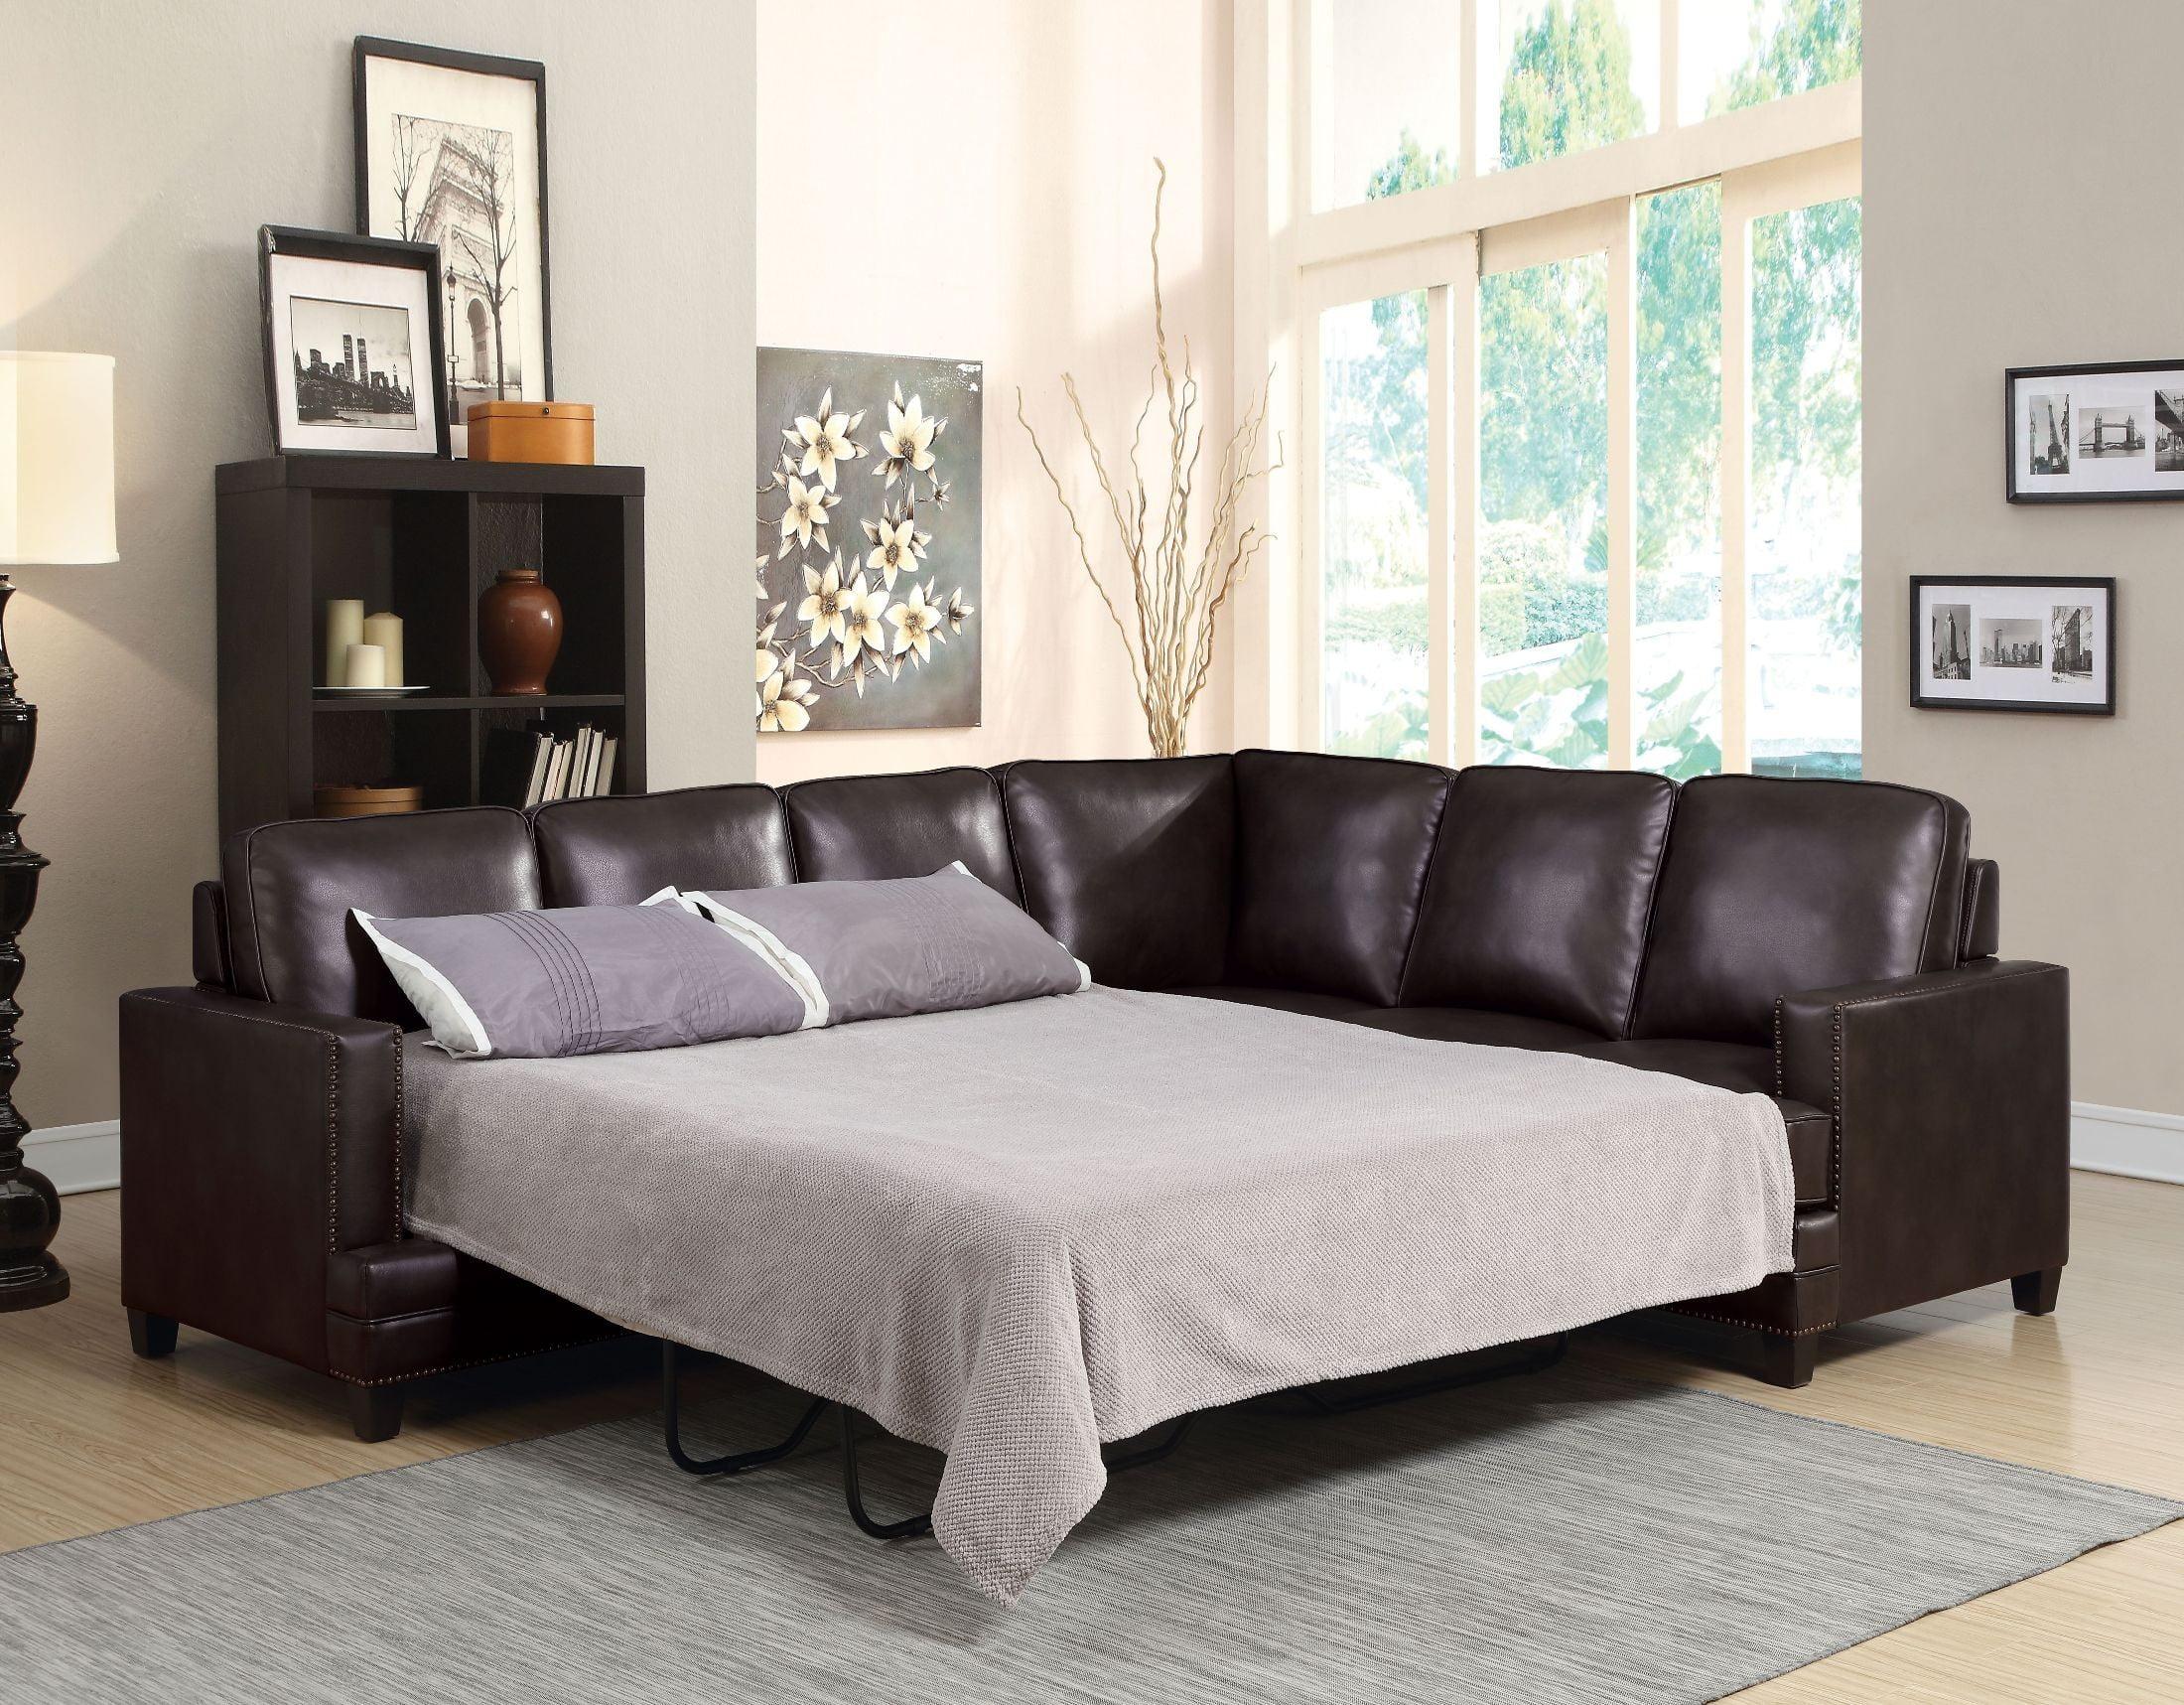 fancy sectional sofas ideas sleeper sofa moon nice with furniture modern